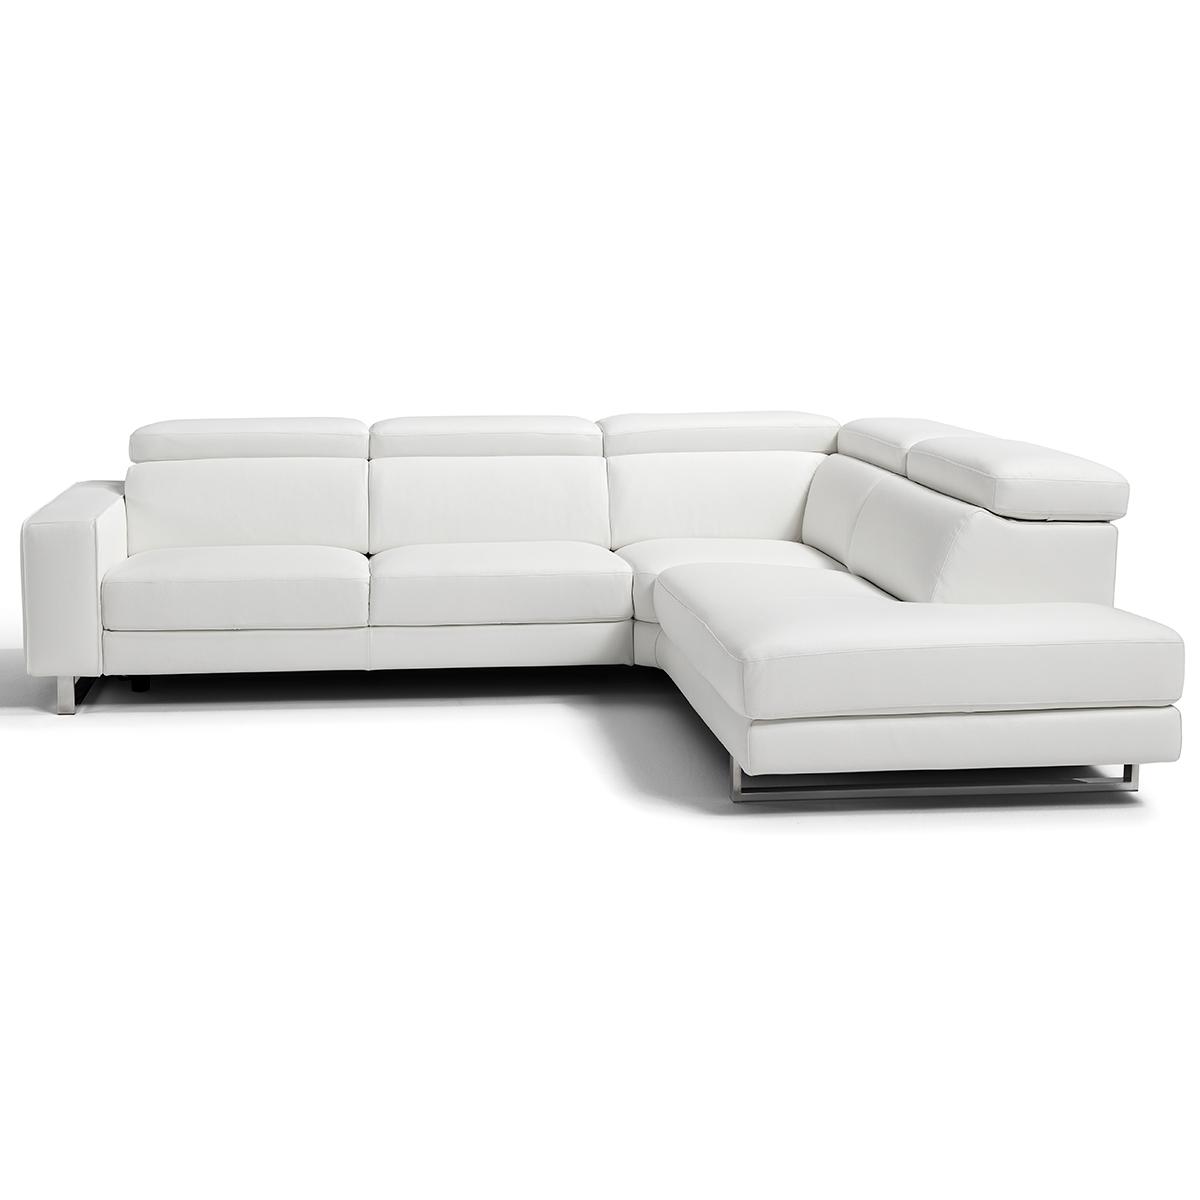 whiteline imports modern furniture decor at dynamic home decor